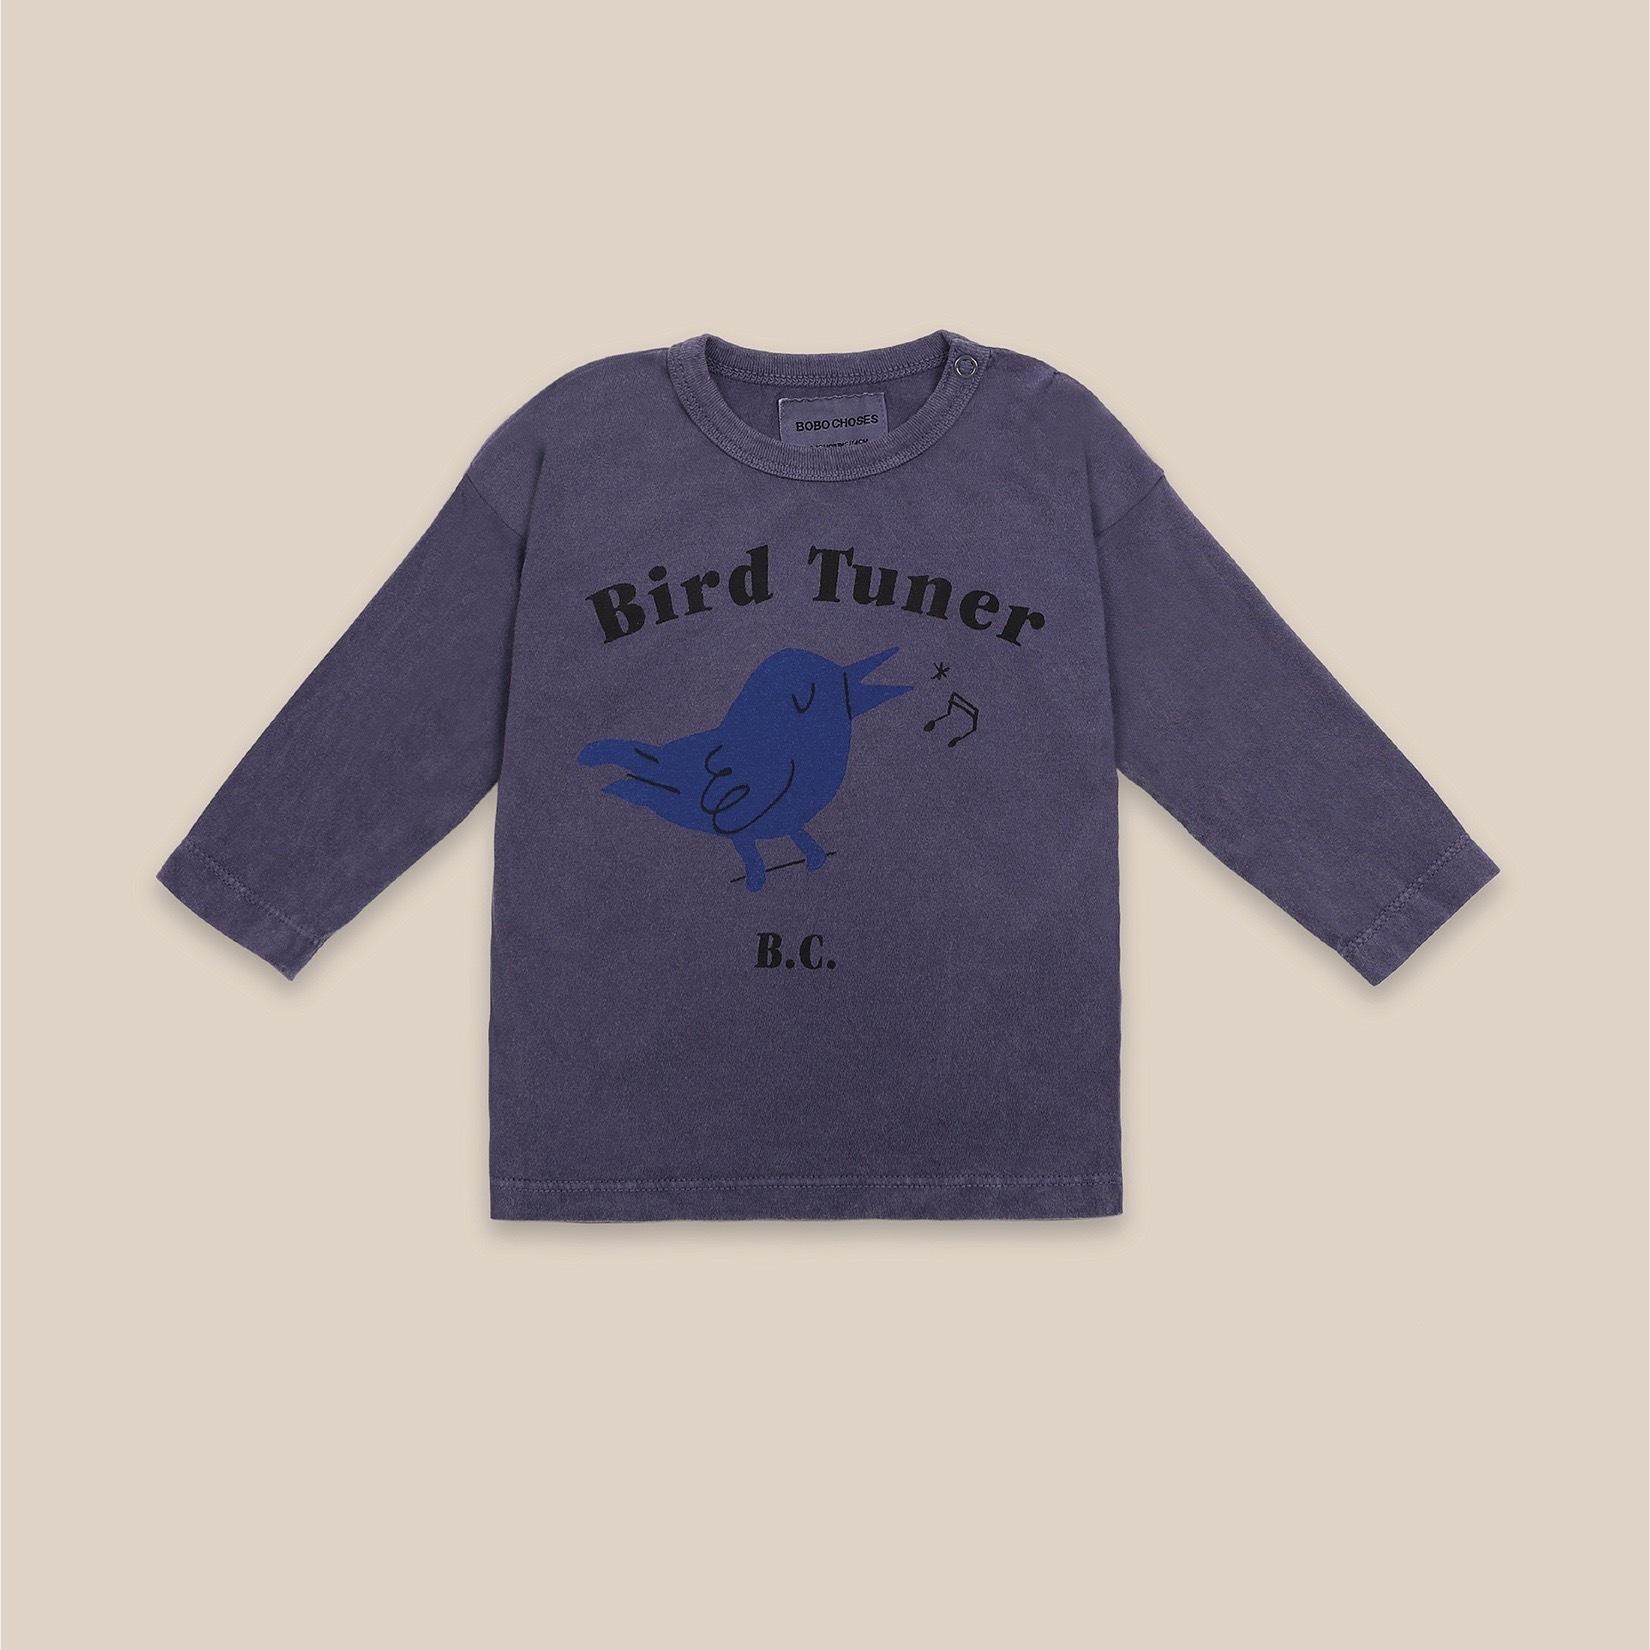 《BOBO CHOSES 2020AW》Bird Tuner long sleeve T-shirt / 6-36M